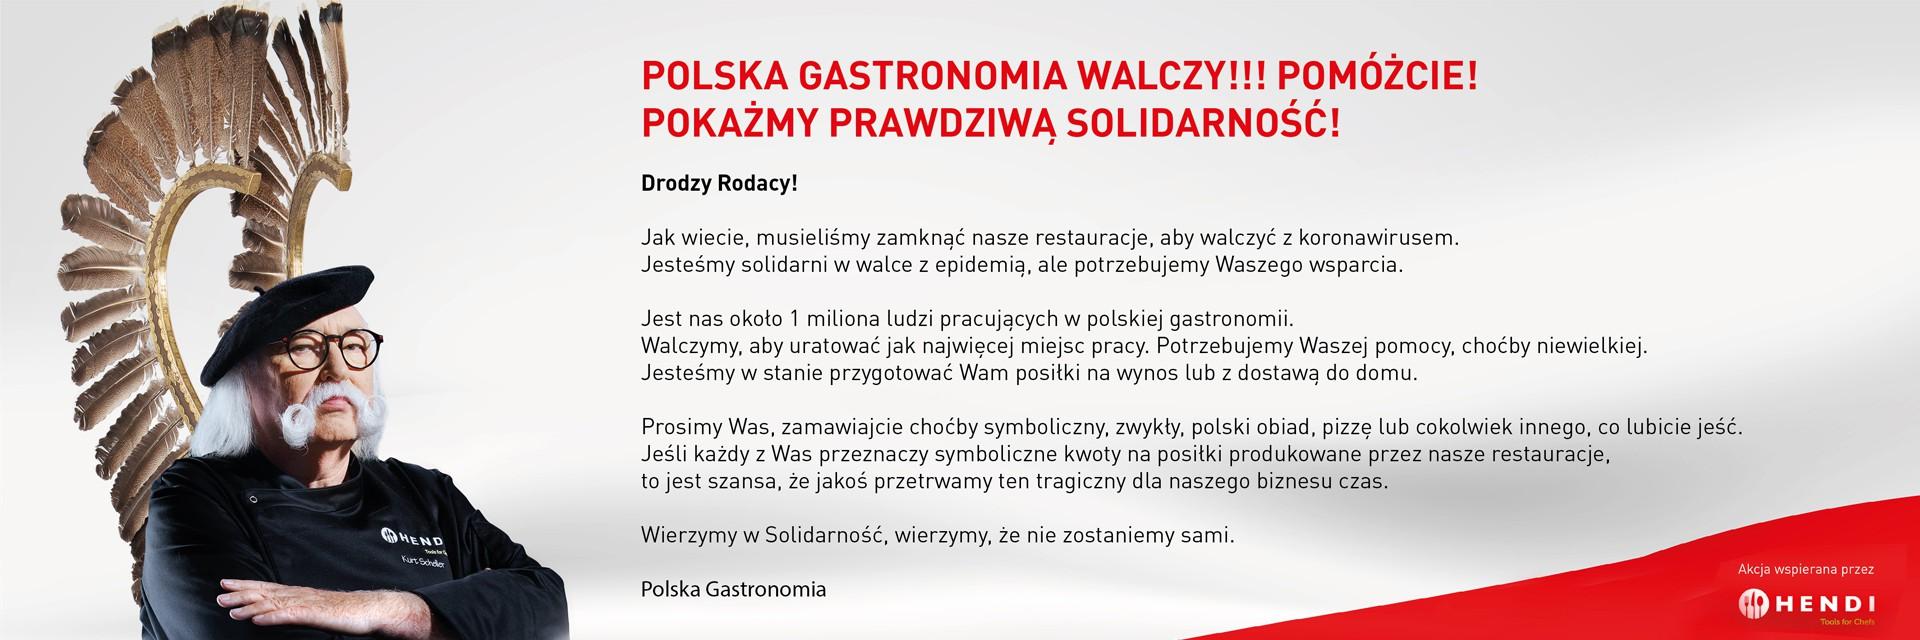 Polska Gastronomia